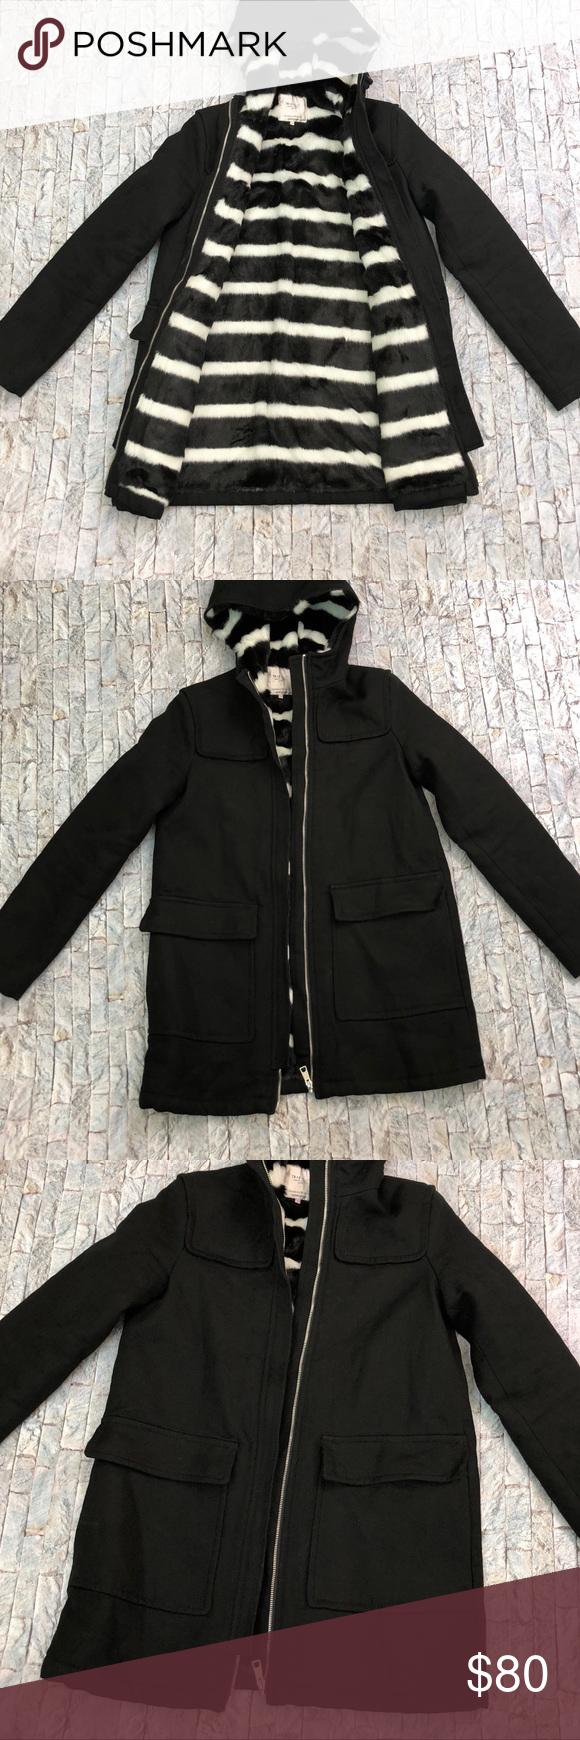 Zara Trafaluc Zebra Lined Jacket Size Xs Line Jackets Fashion Clothes Design [ 1740 x 580 Pixel ]